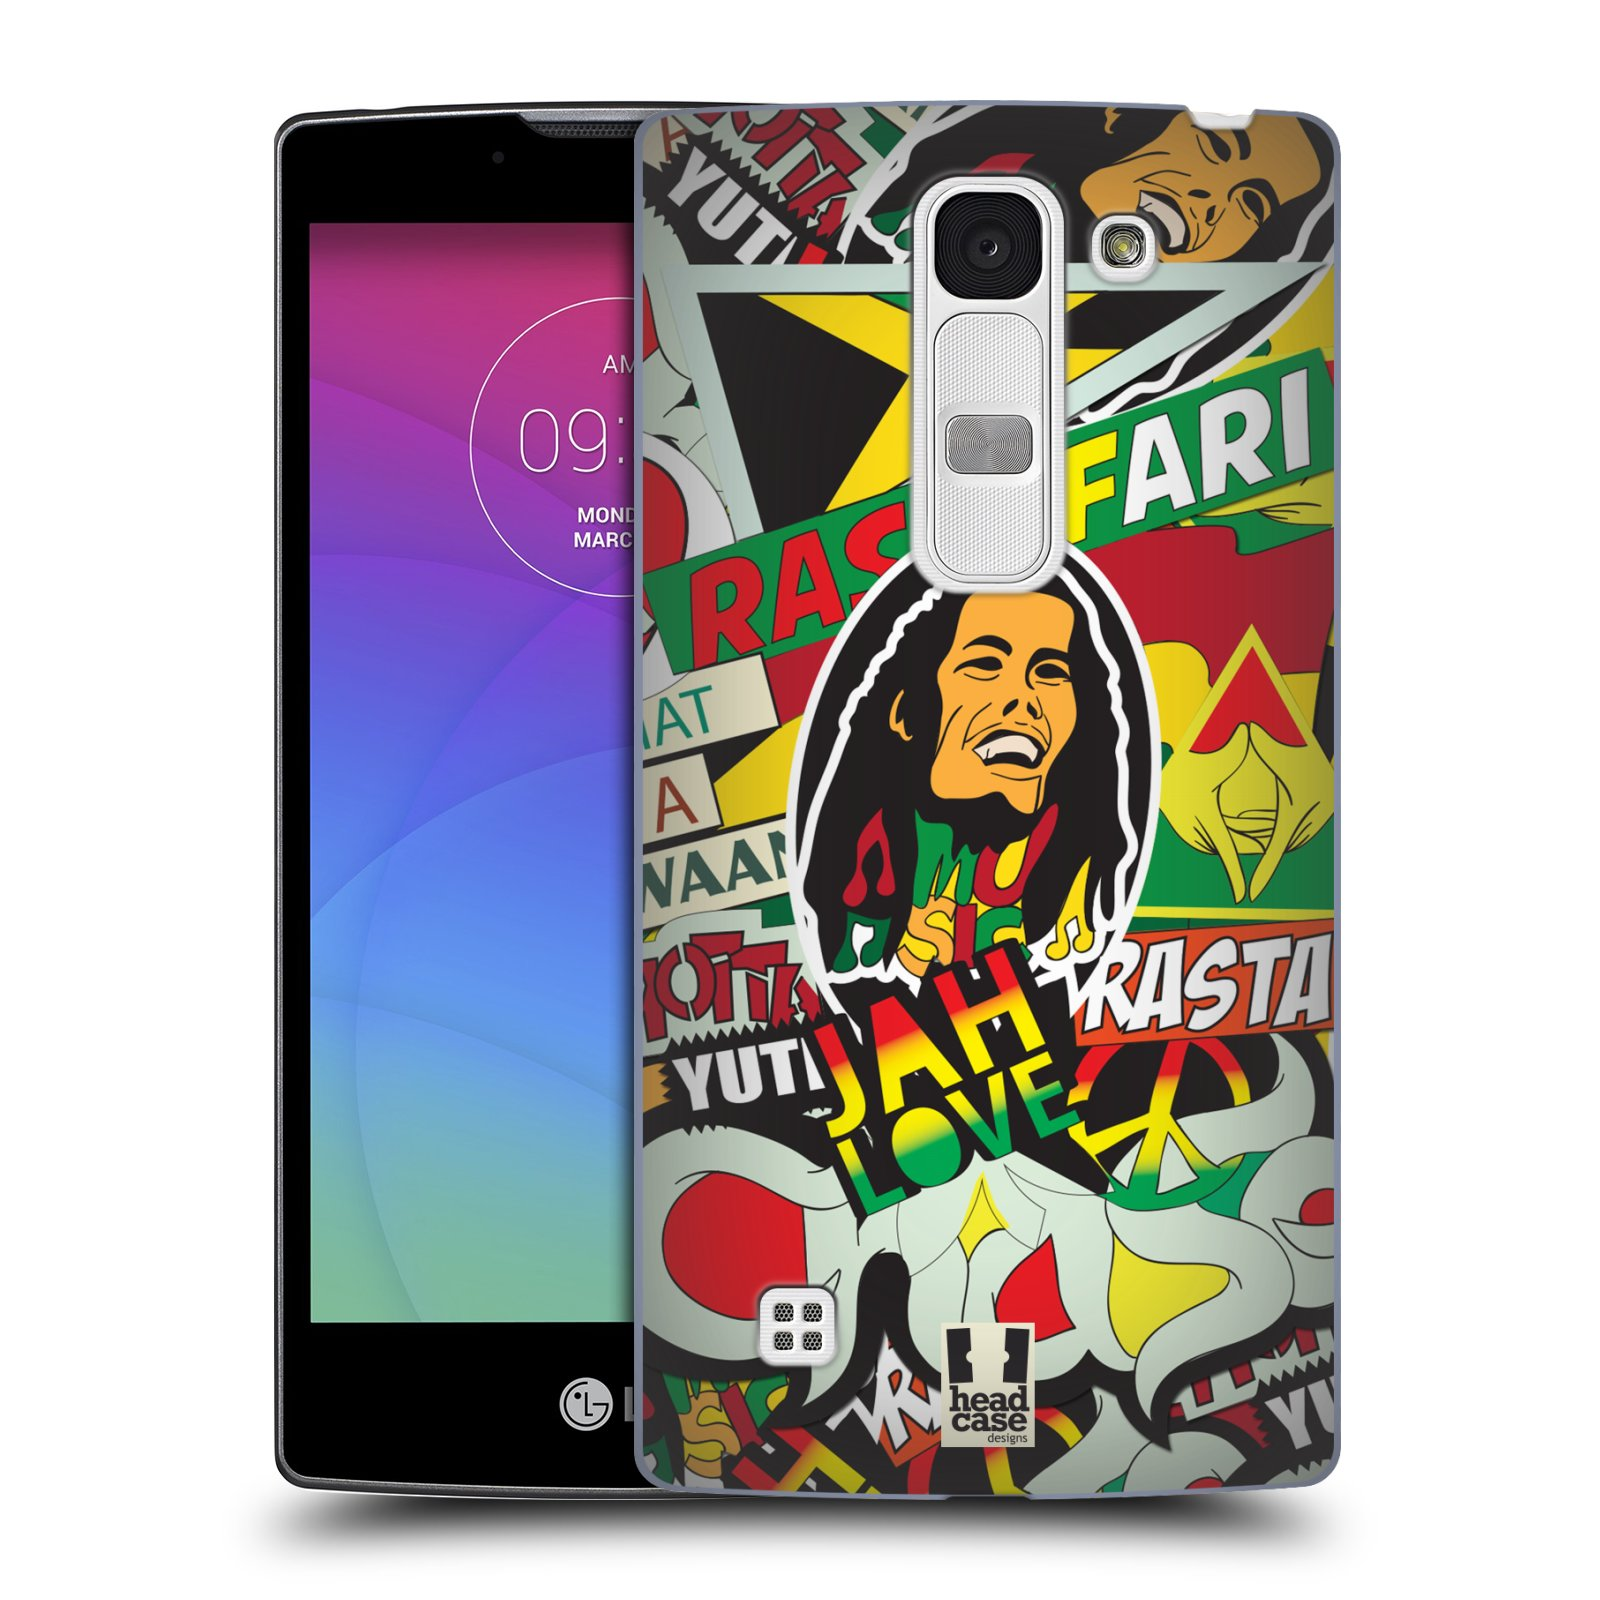 Plastové pouzdro na mobil LG Spirit LTE HEAD CASE RASTA (Kryt či obal na mobilní telefon LG Spirit H420 a LG Spirit LTE H440N)